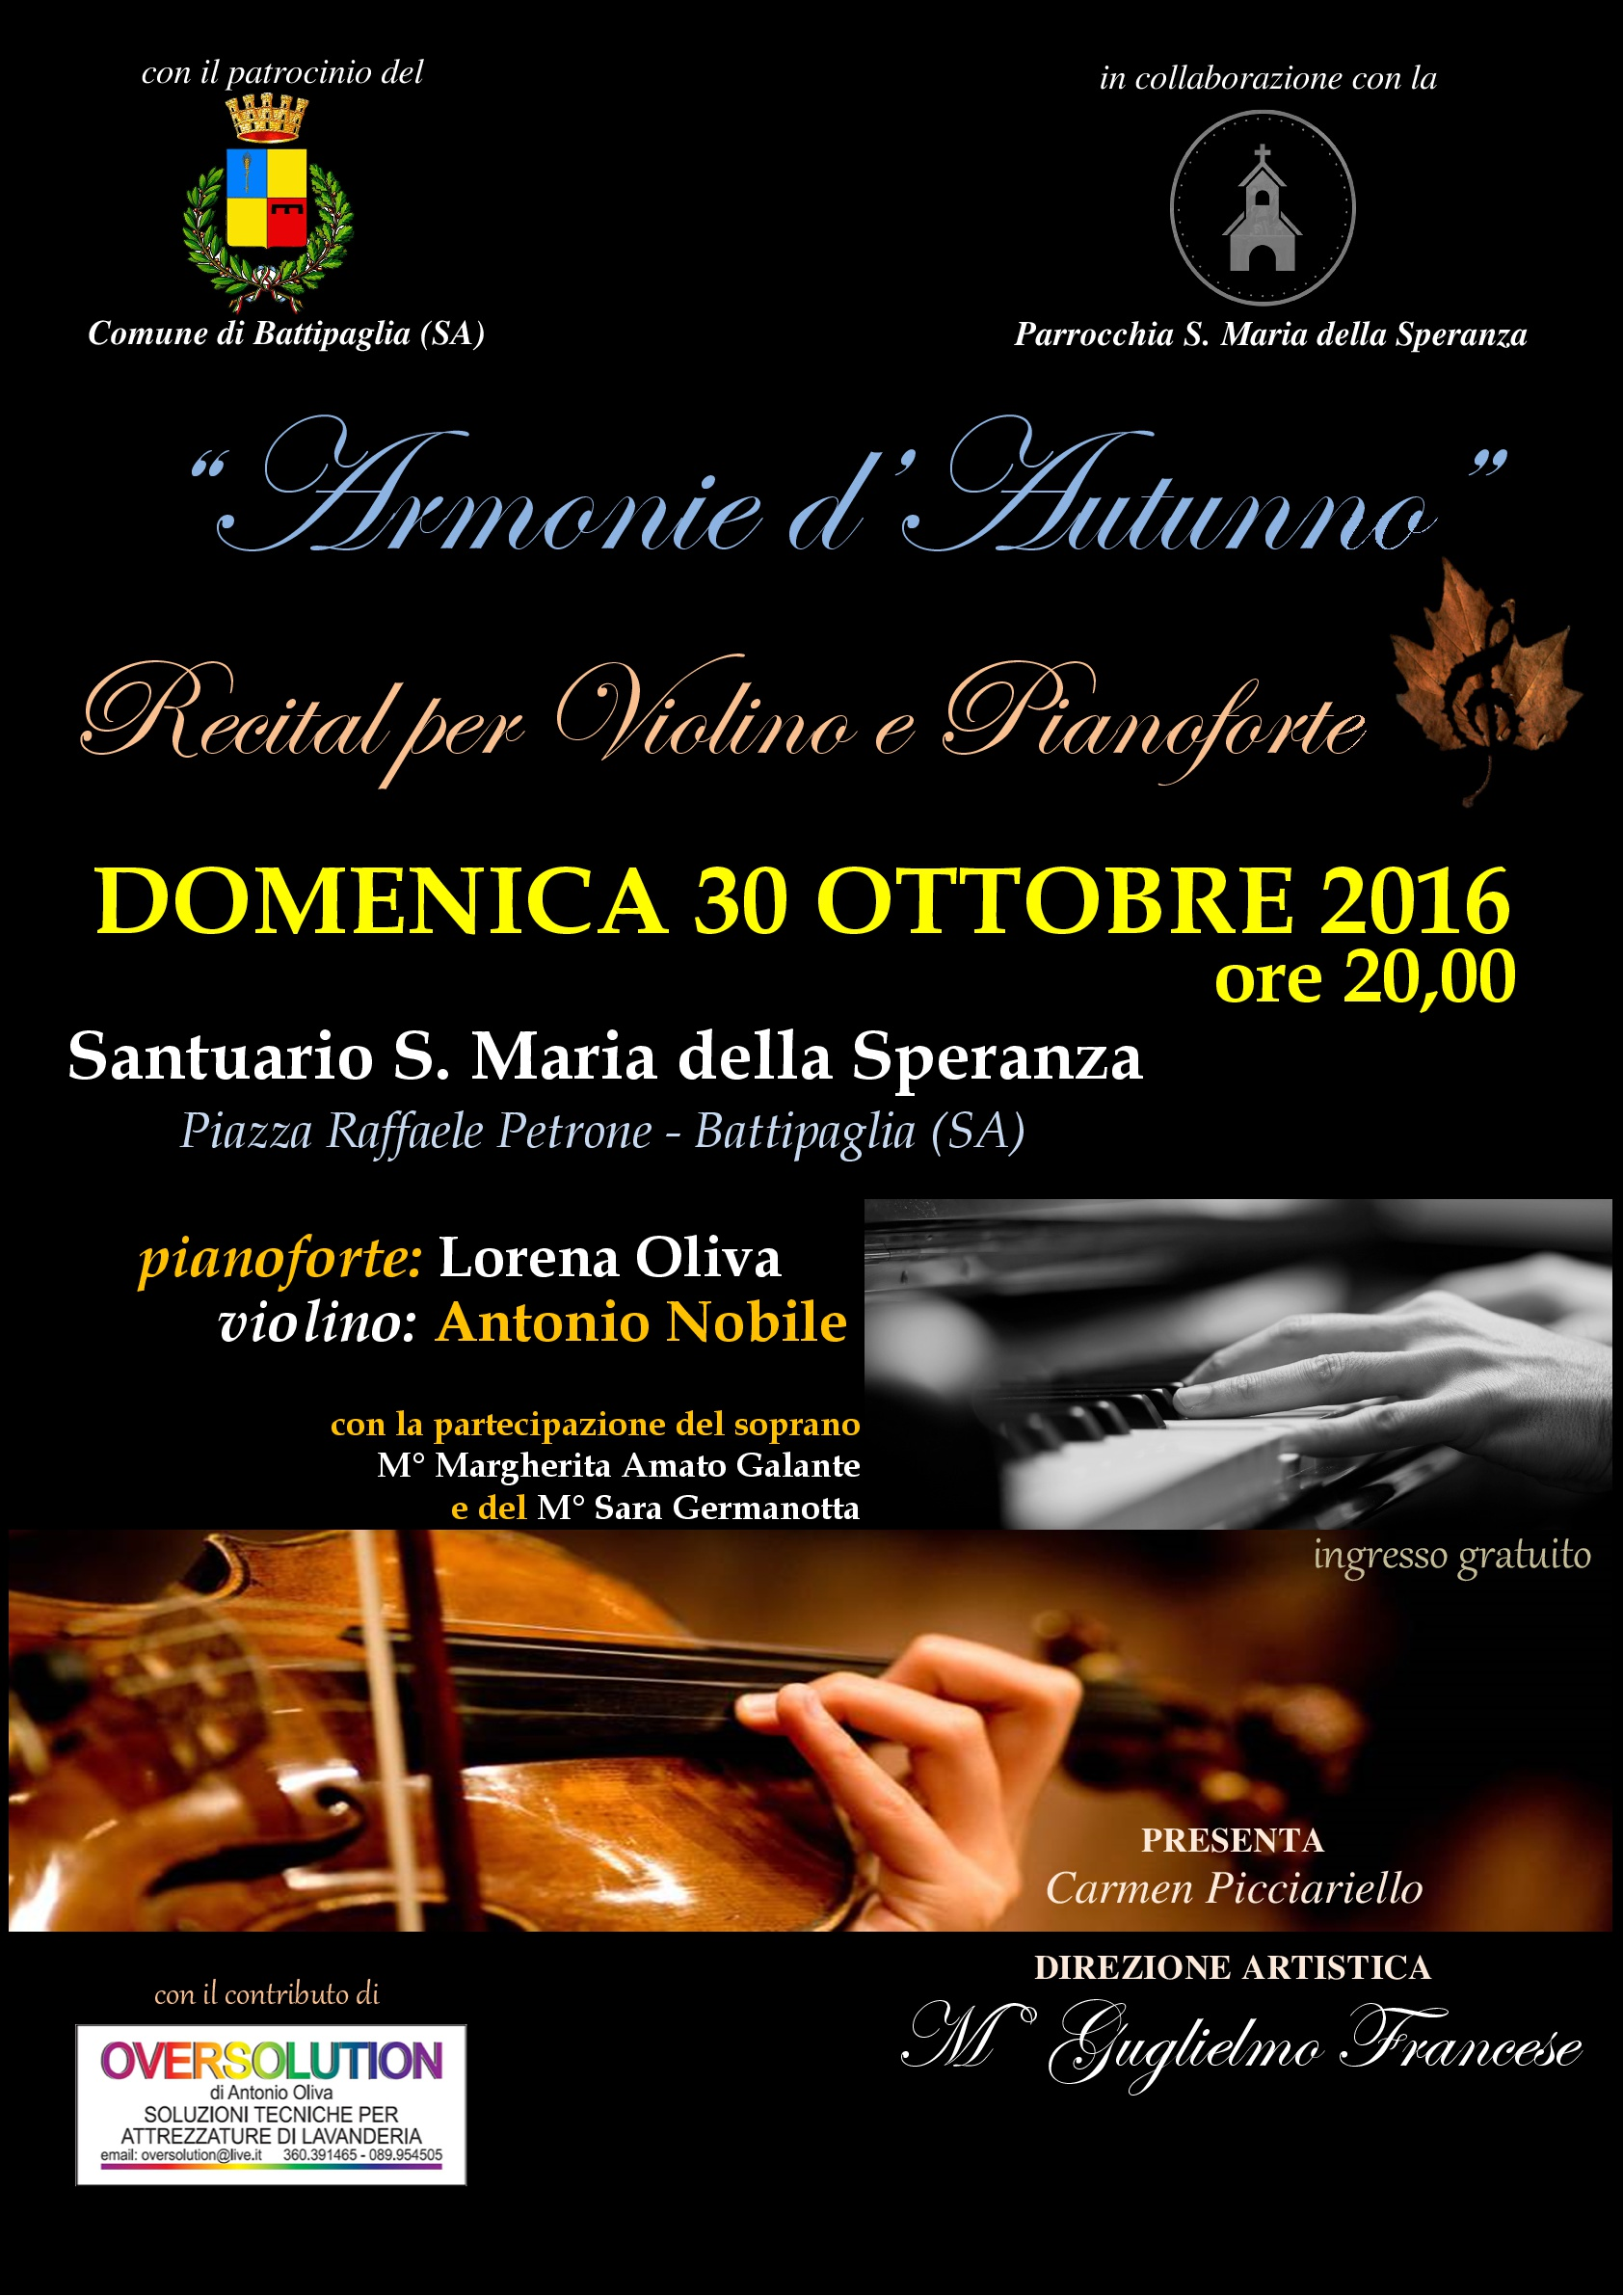 locandina-concerto-antonio nobile-lorena oliva